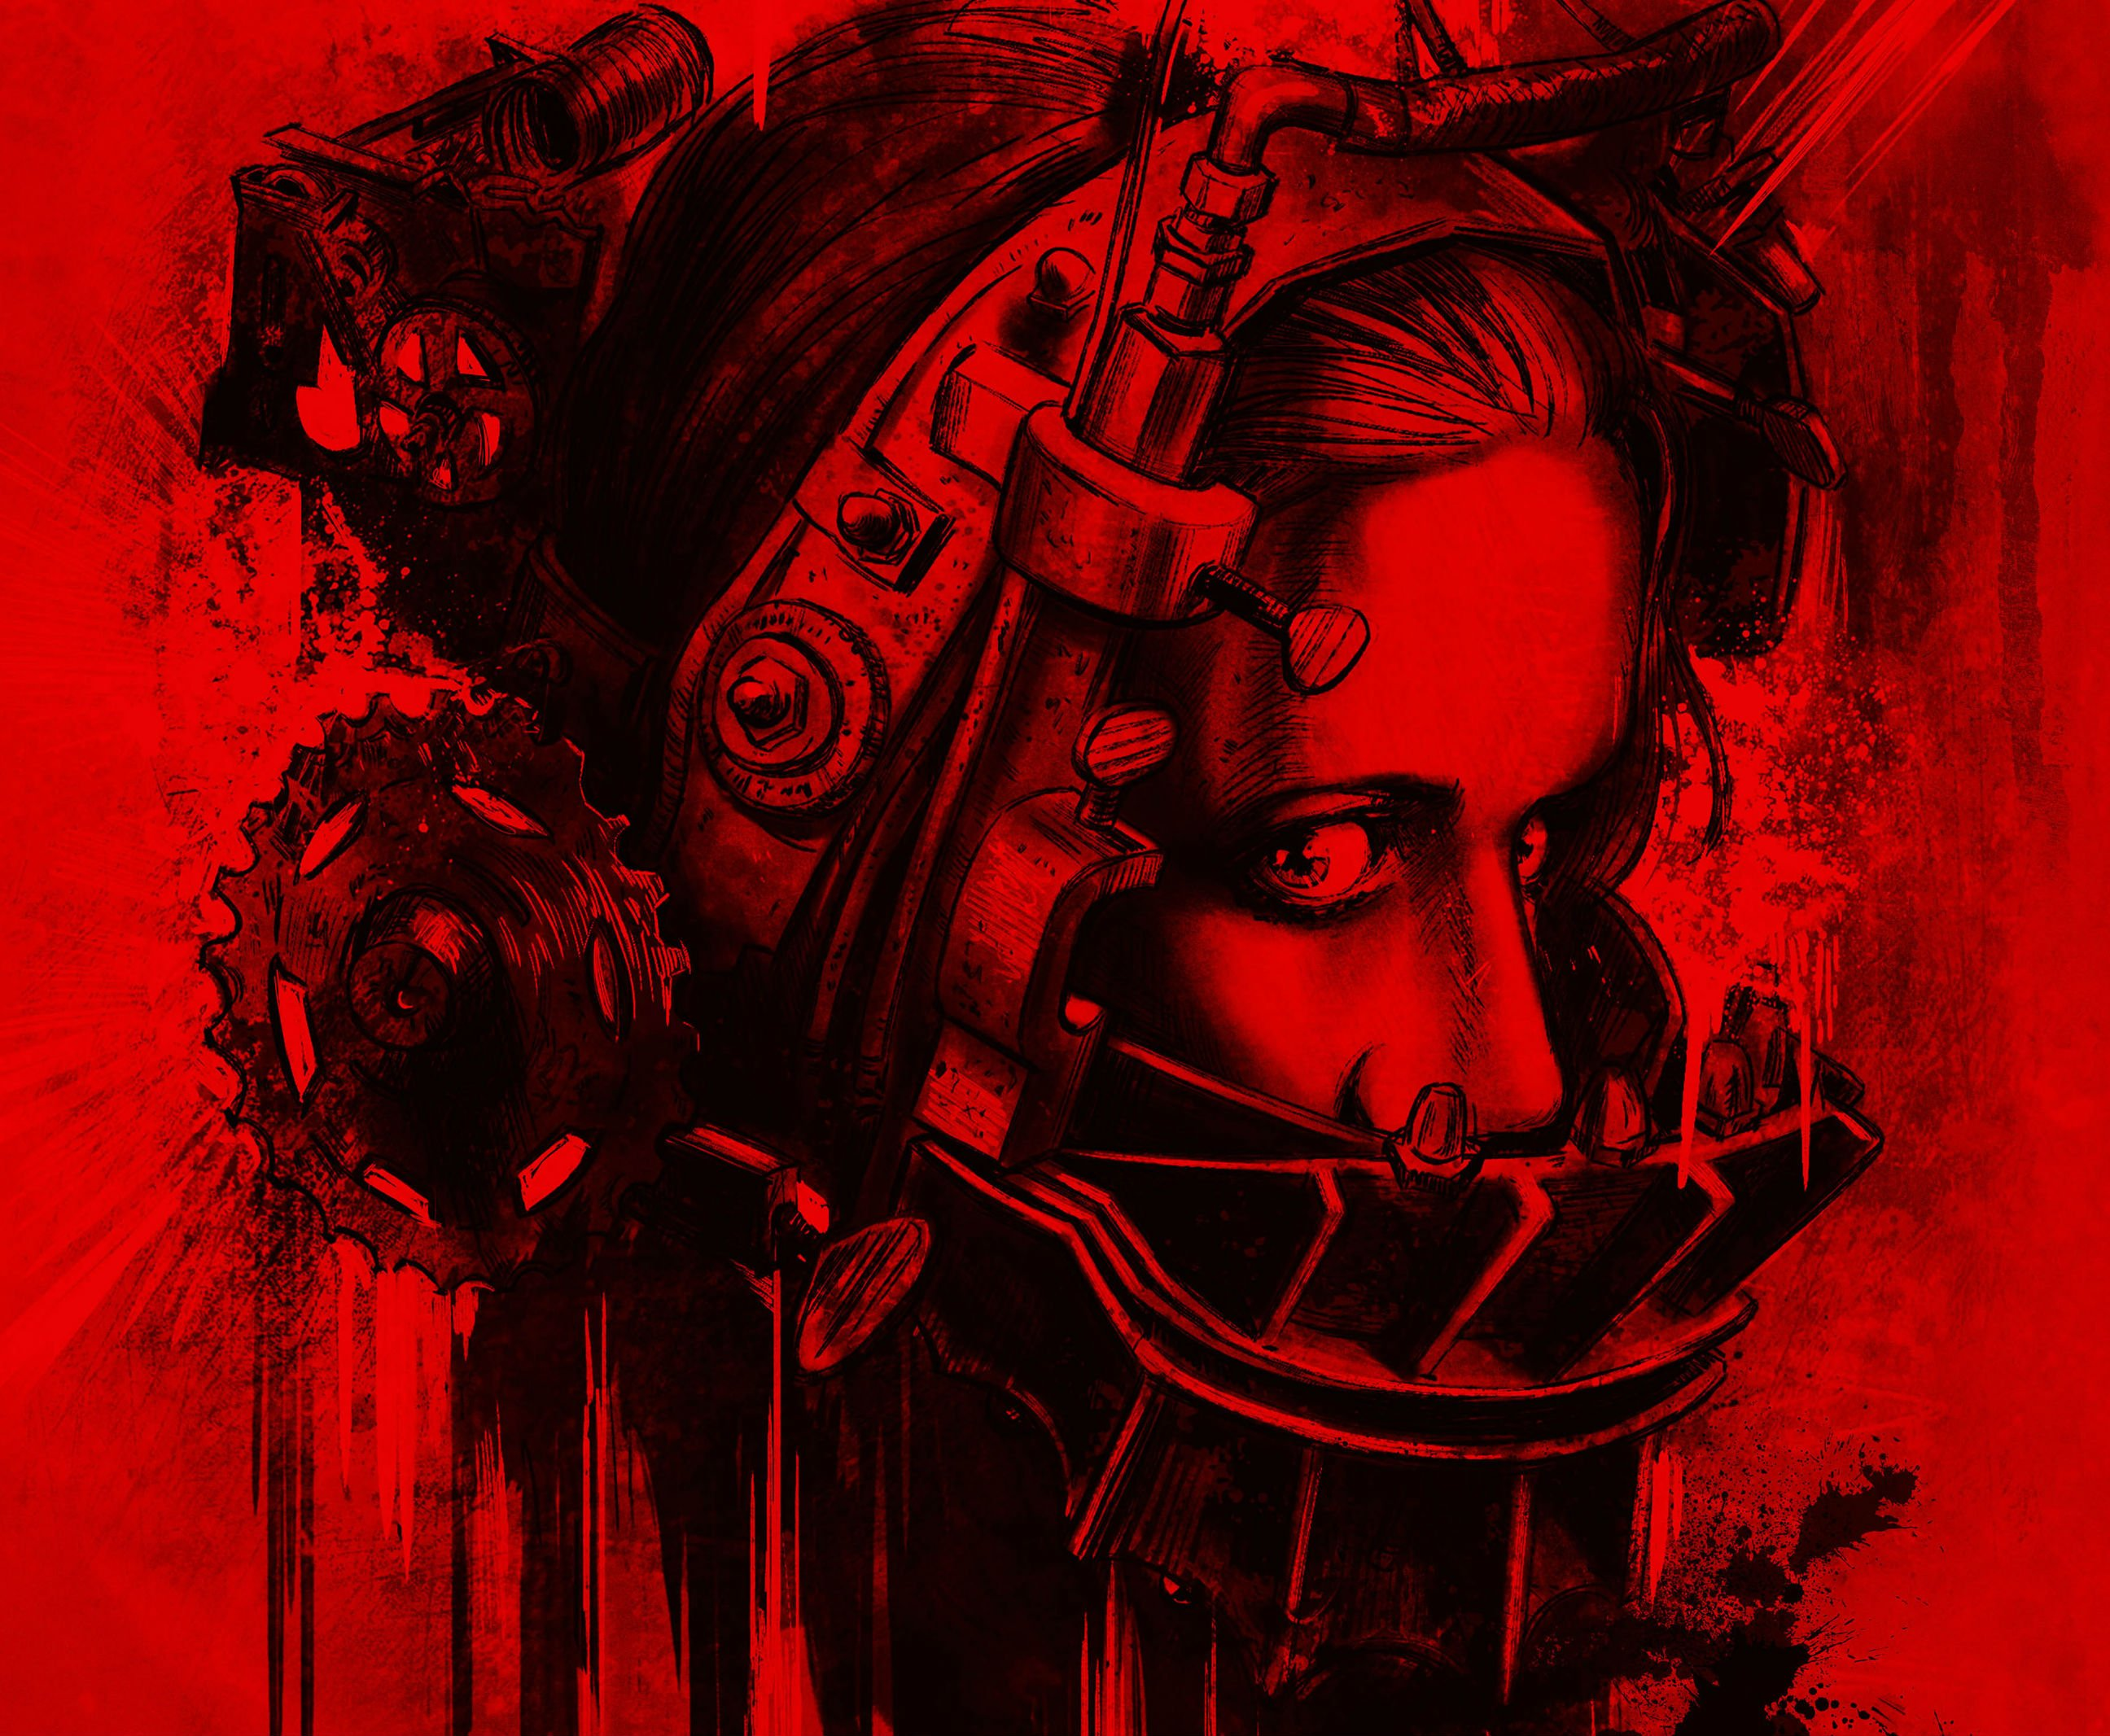 Saw Horror Dark Thriller Evil 1saw Mask Blood Wallpaper